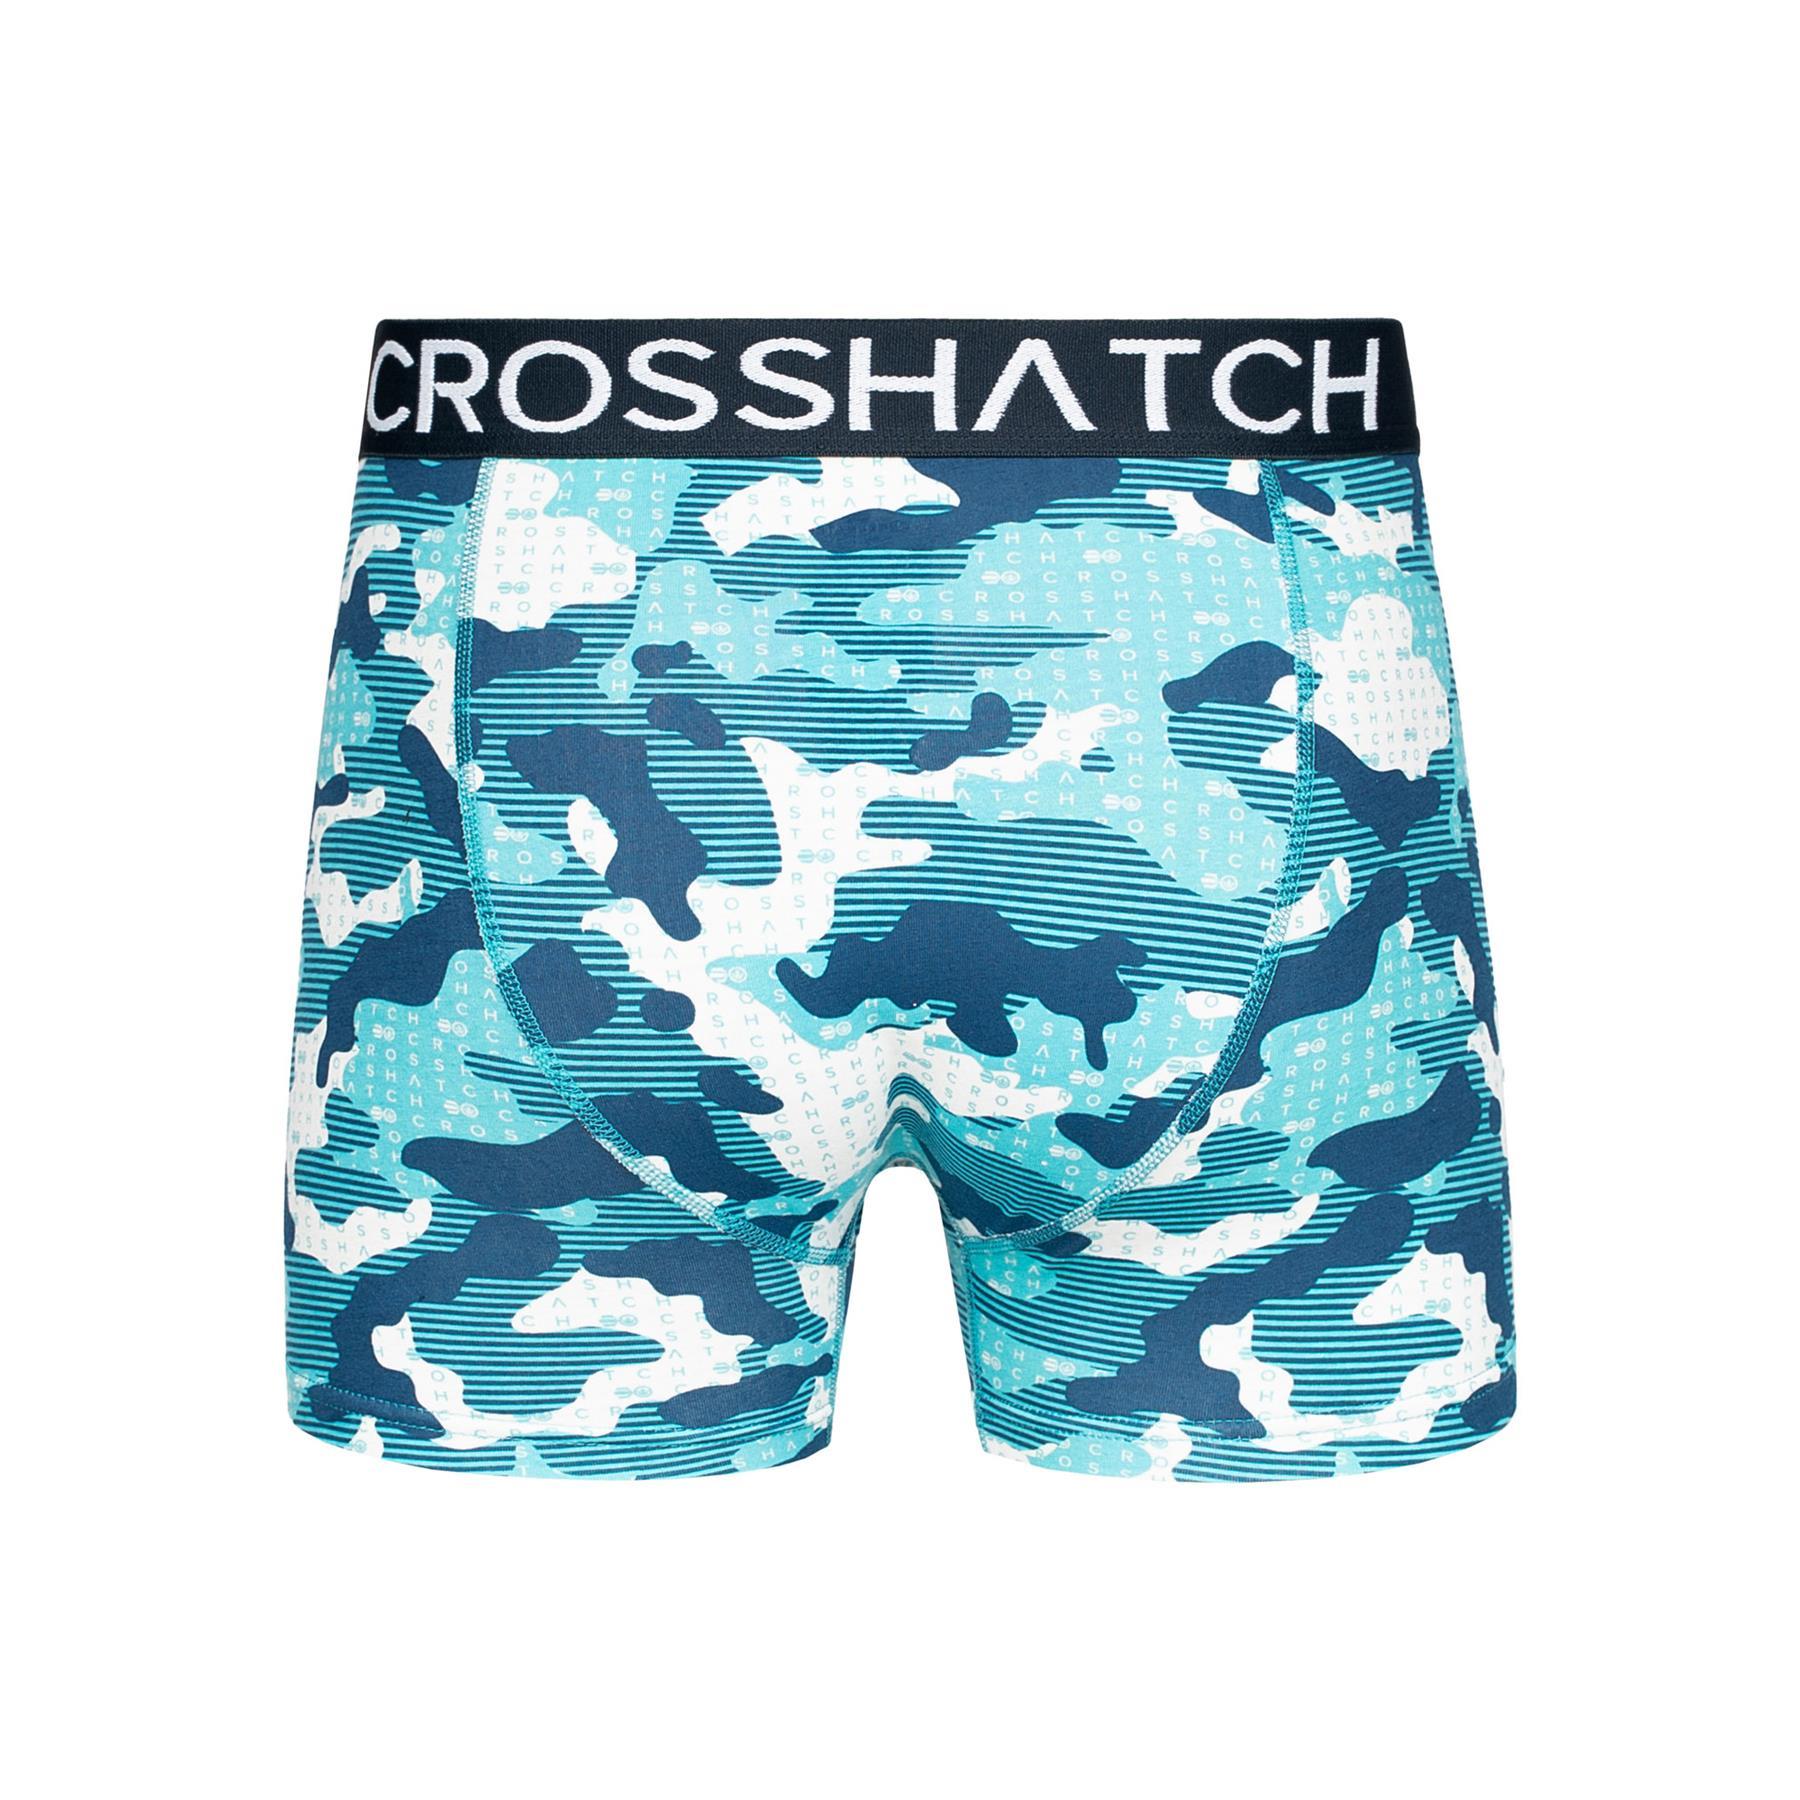 thumbnail 61 - Mens Crosshatch Boxers 3 Pack Shorts Underwear Trunks Underpants Multipack Sets